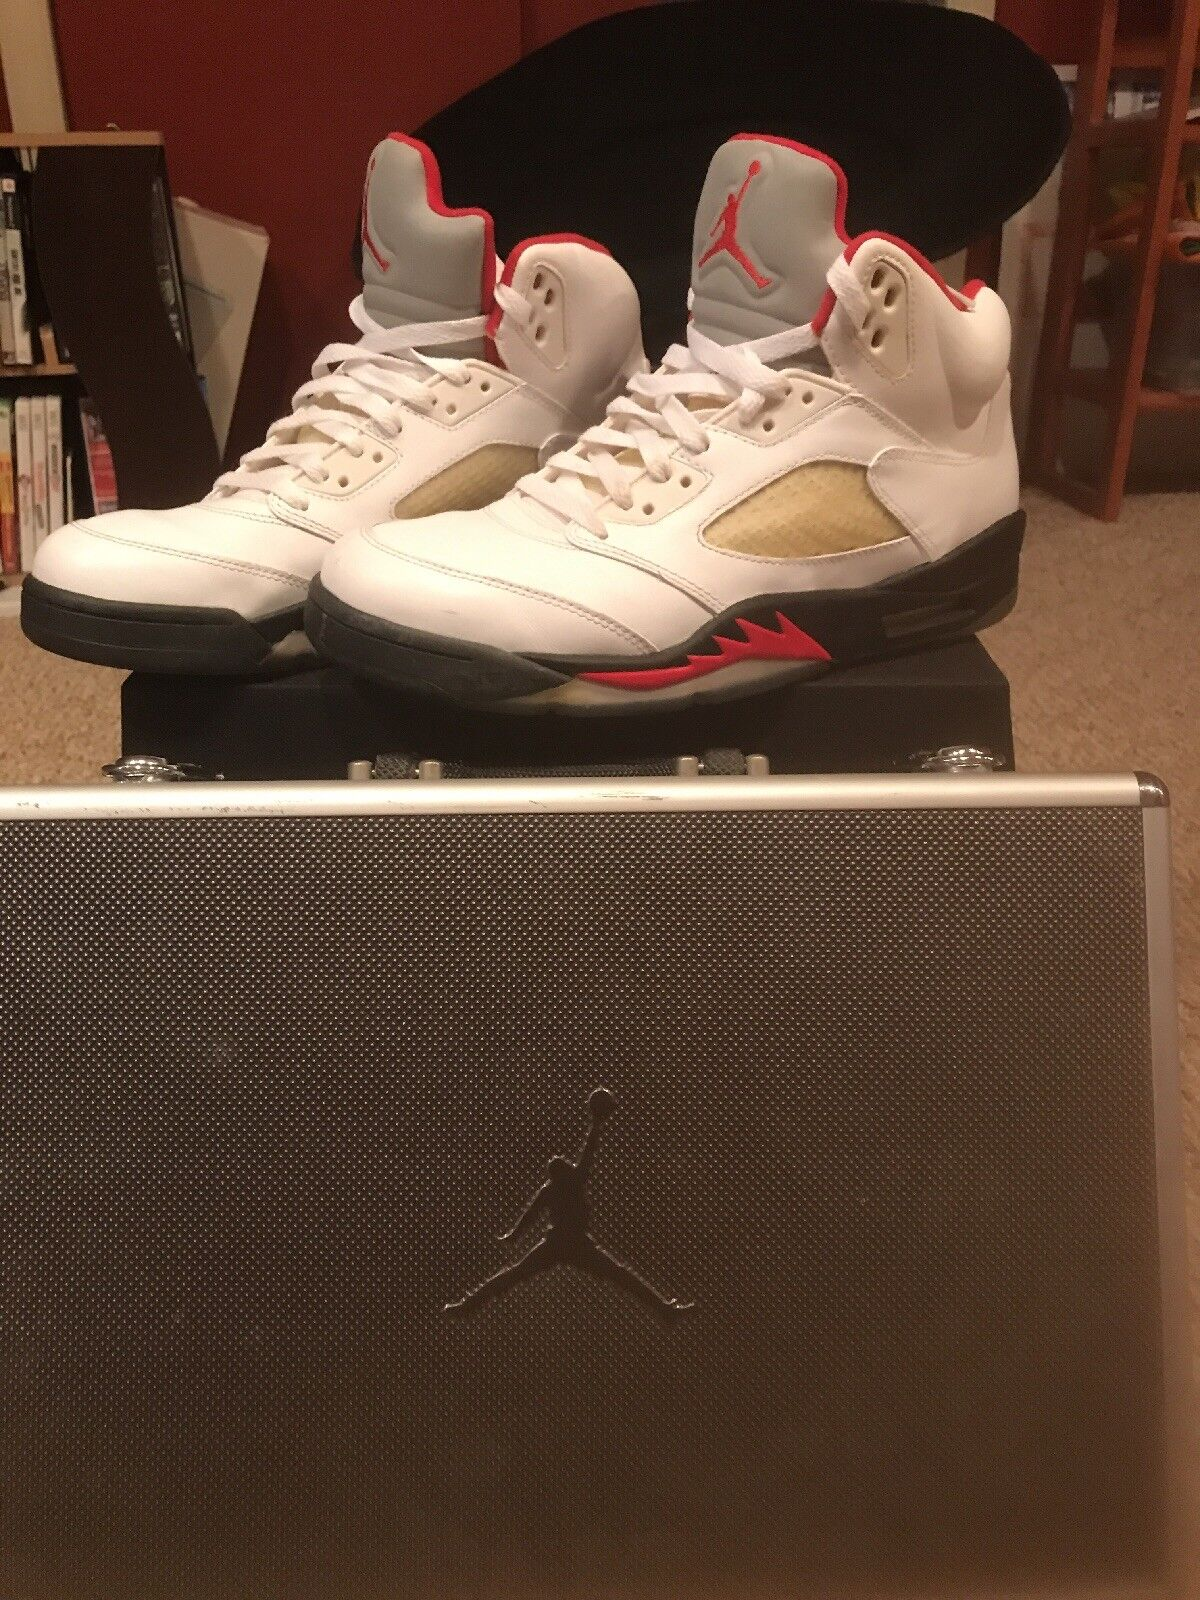 Nike Air Jordan Retro 5 Fire Red Comfortable Comfortable and good-looking